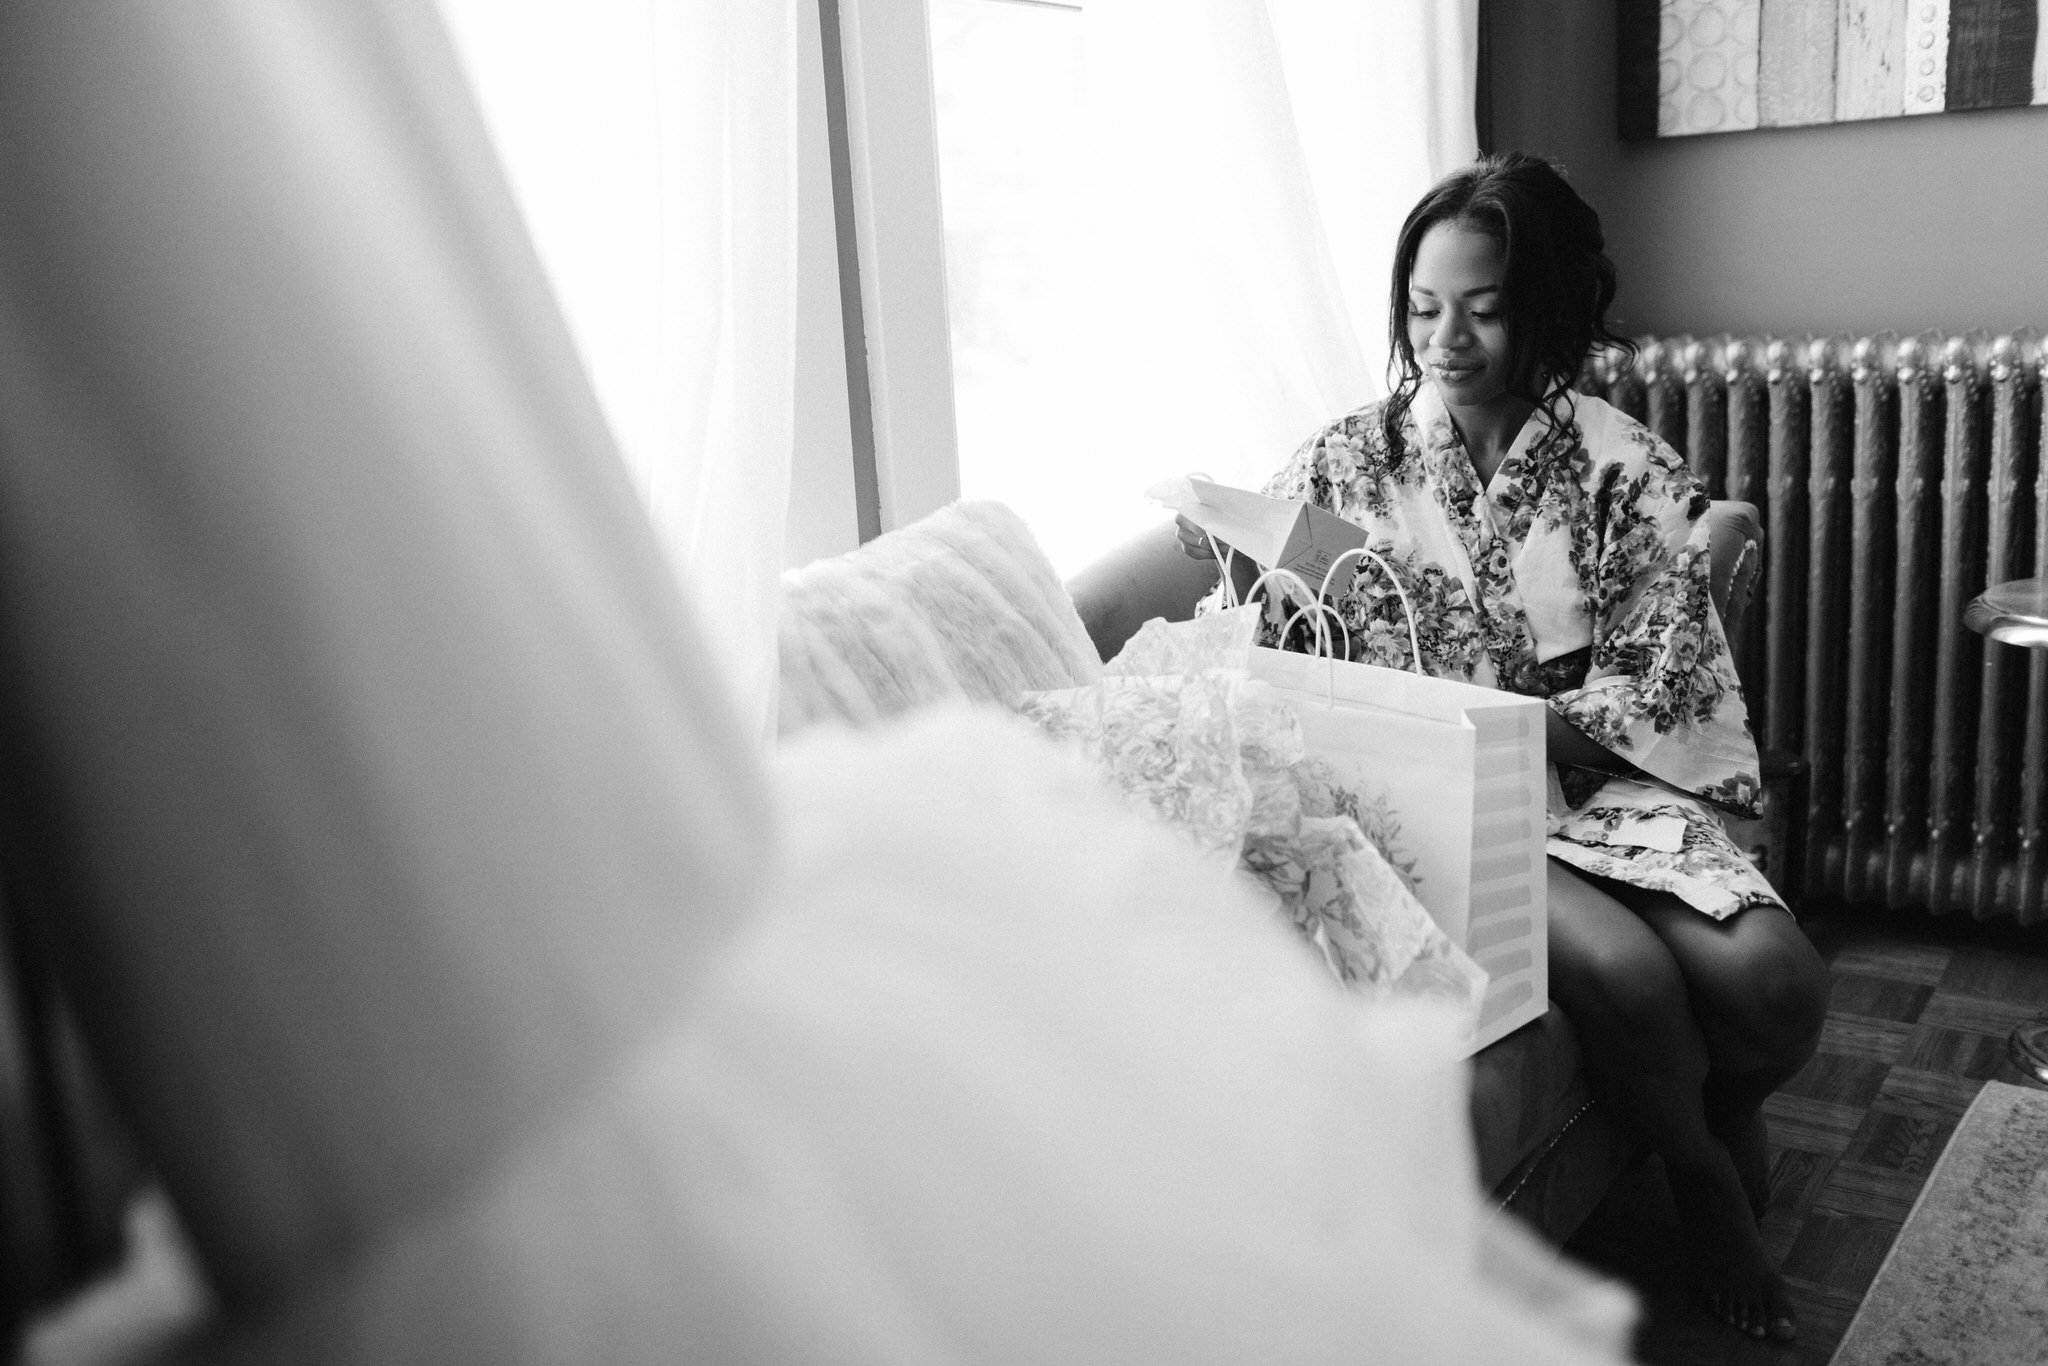 Toronto Wedding Photographer, Oshawa Wedding Photographer, Junebug Weddings, Wedding Details, Toronto Wedding, YYC Wedding, YYZ Wedding, Calgary Wedding Photographer, Wedding Dress, Beautiful Canadian Weddings, Canadian Photographer, Female Photographer, Love Stories, Fine Art Wedding Canada, Fine art wedding Calgary, Fine art Weddings